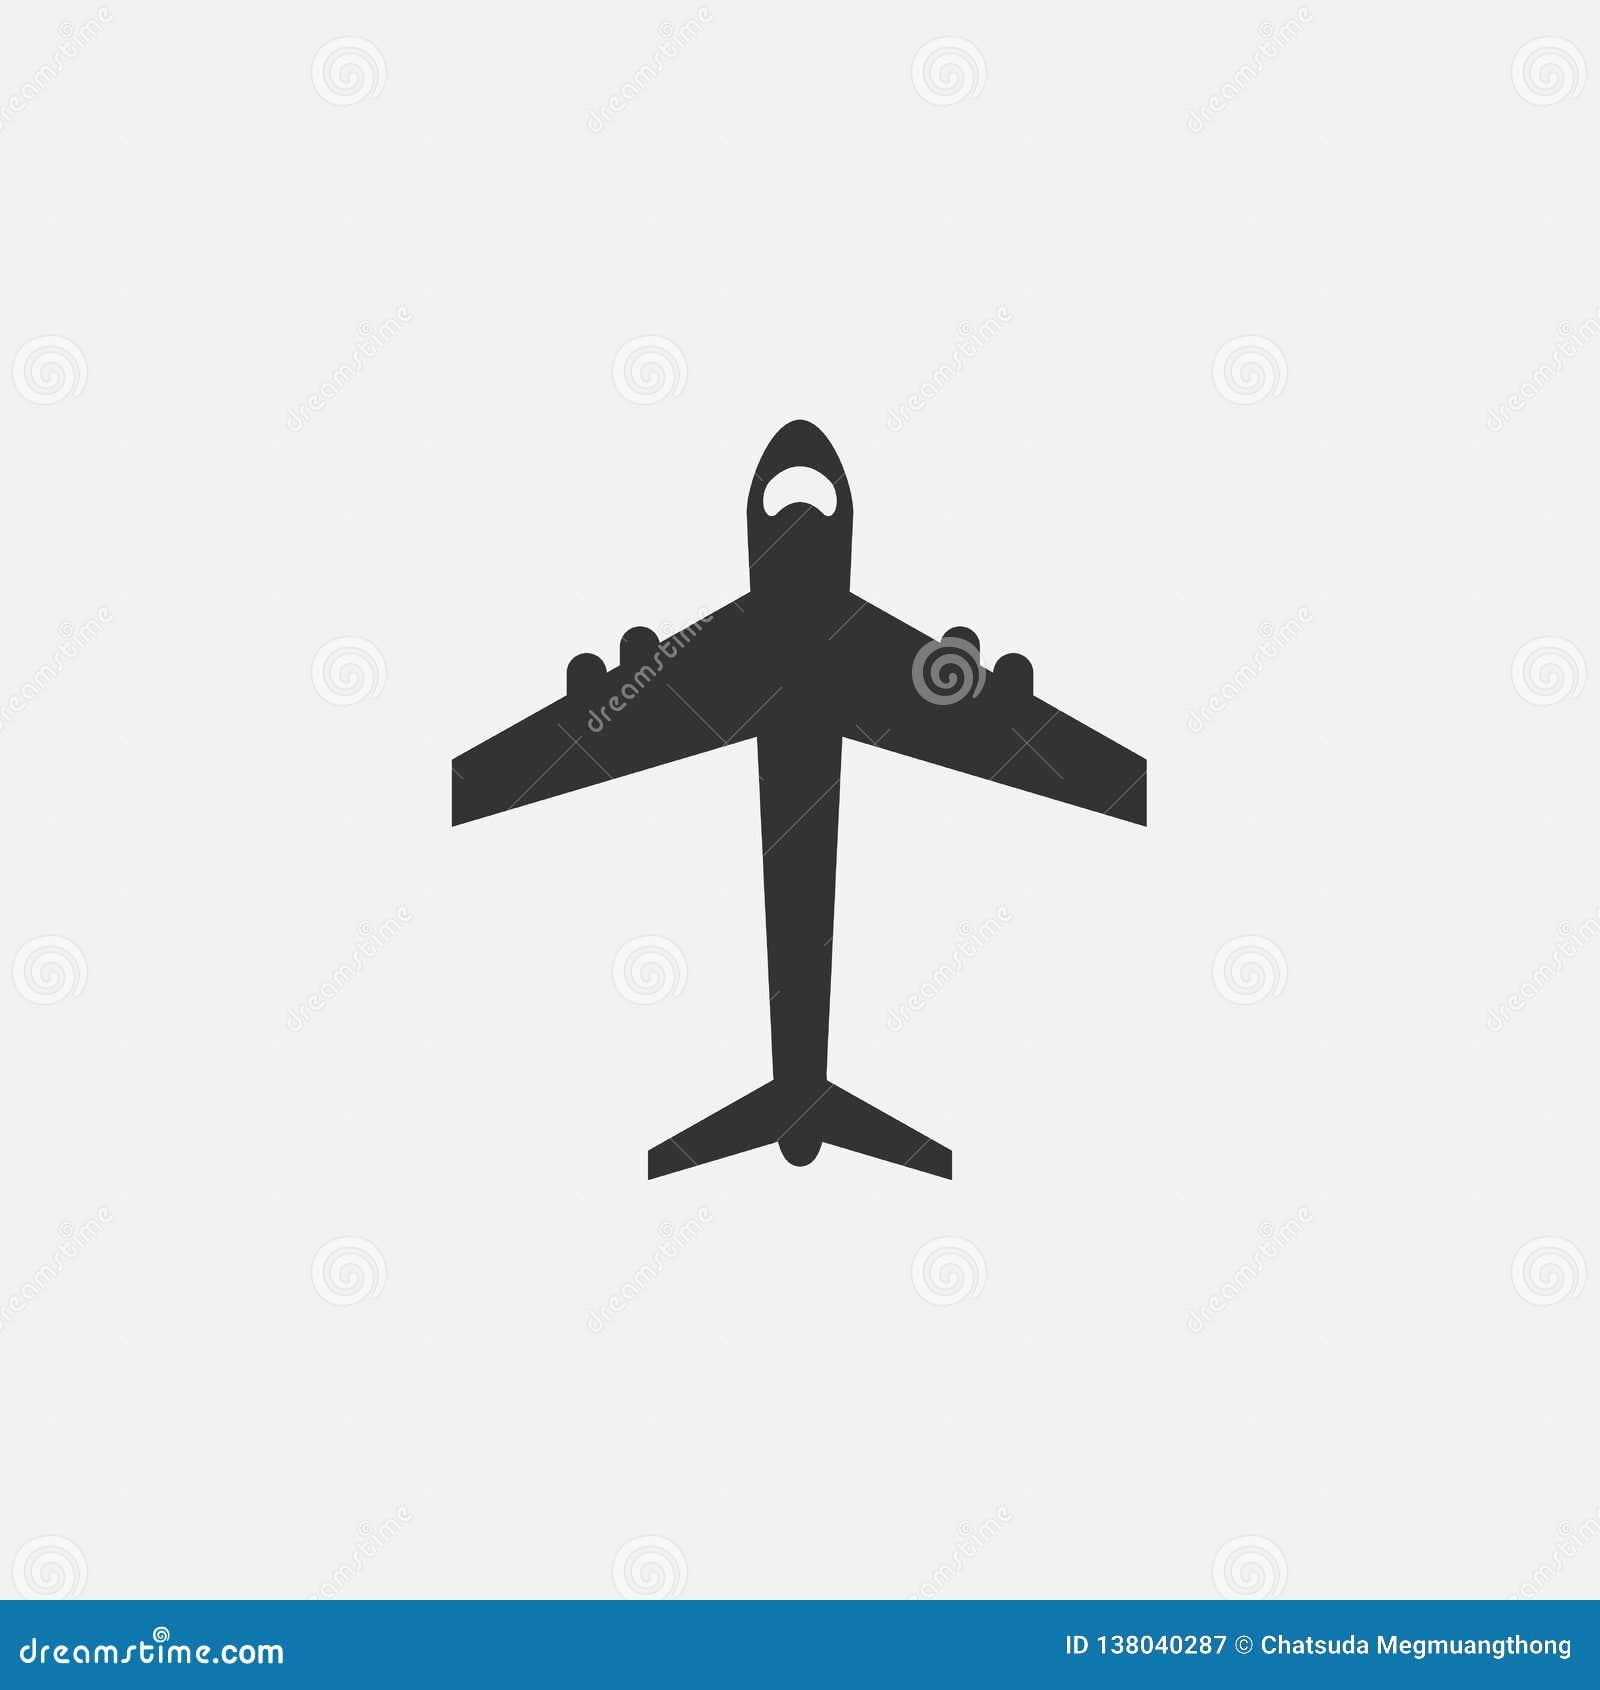 Aerei, aereo, aeroplano, aeroplano, volo